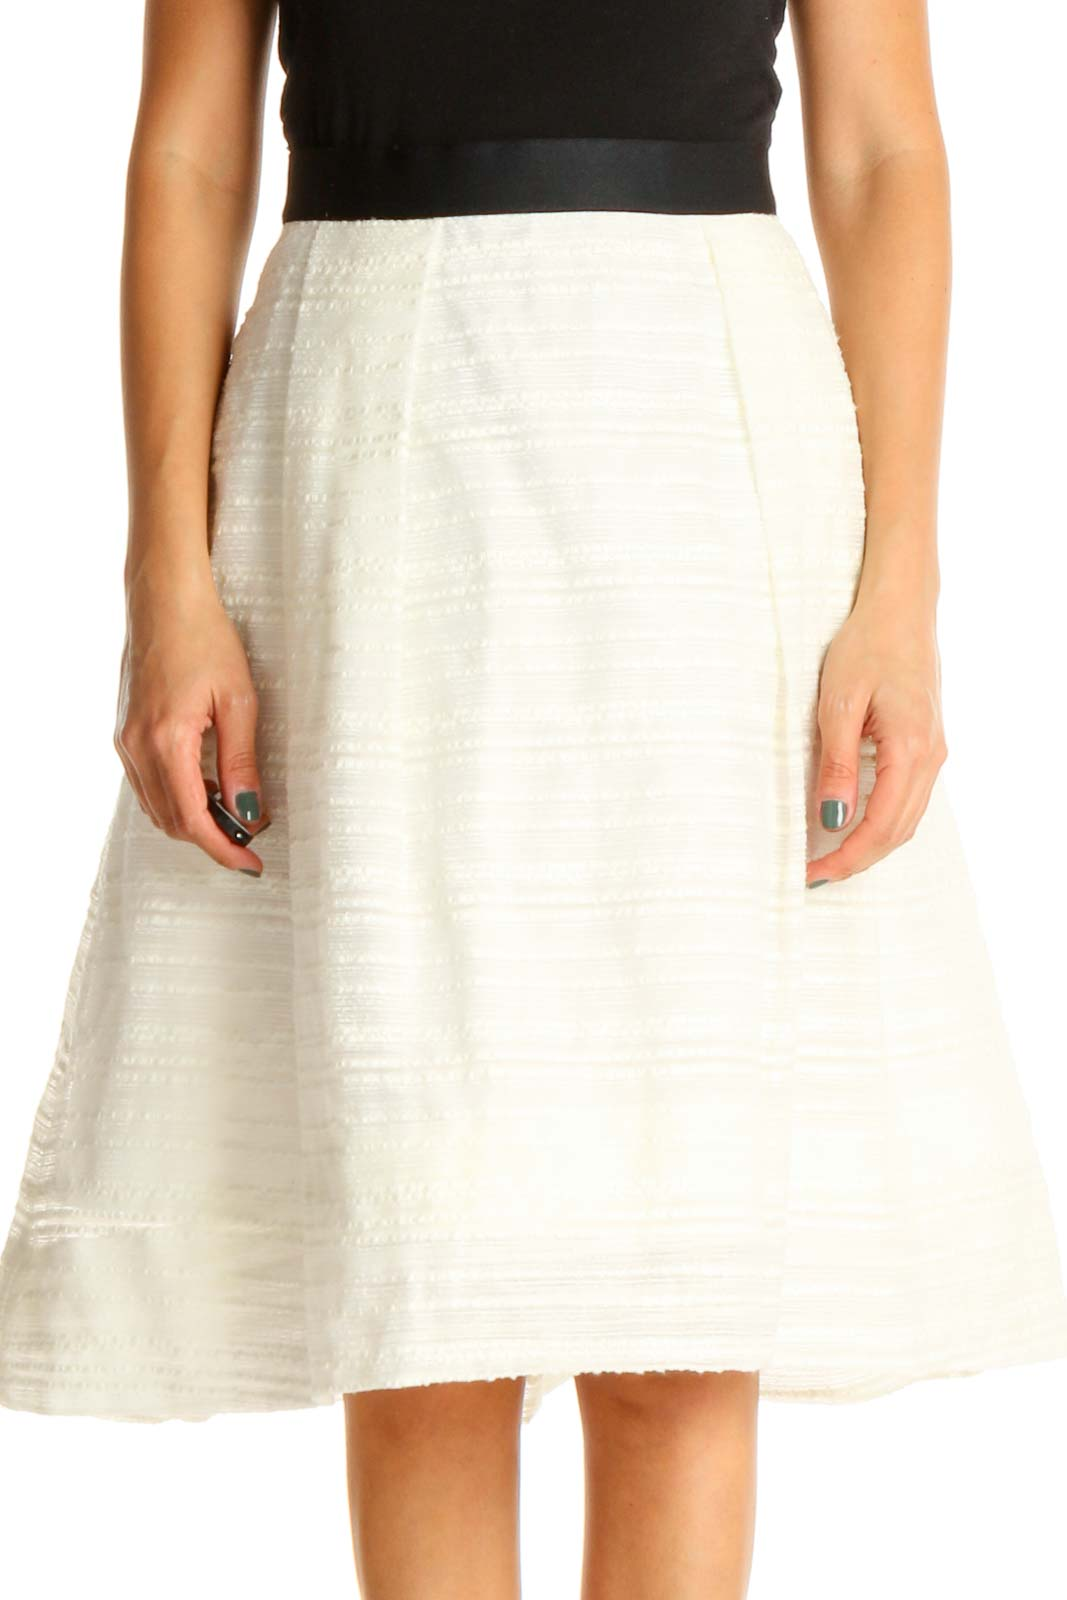 White Brunch A-Line Skirt Front